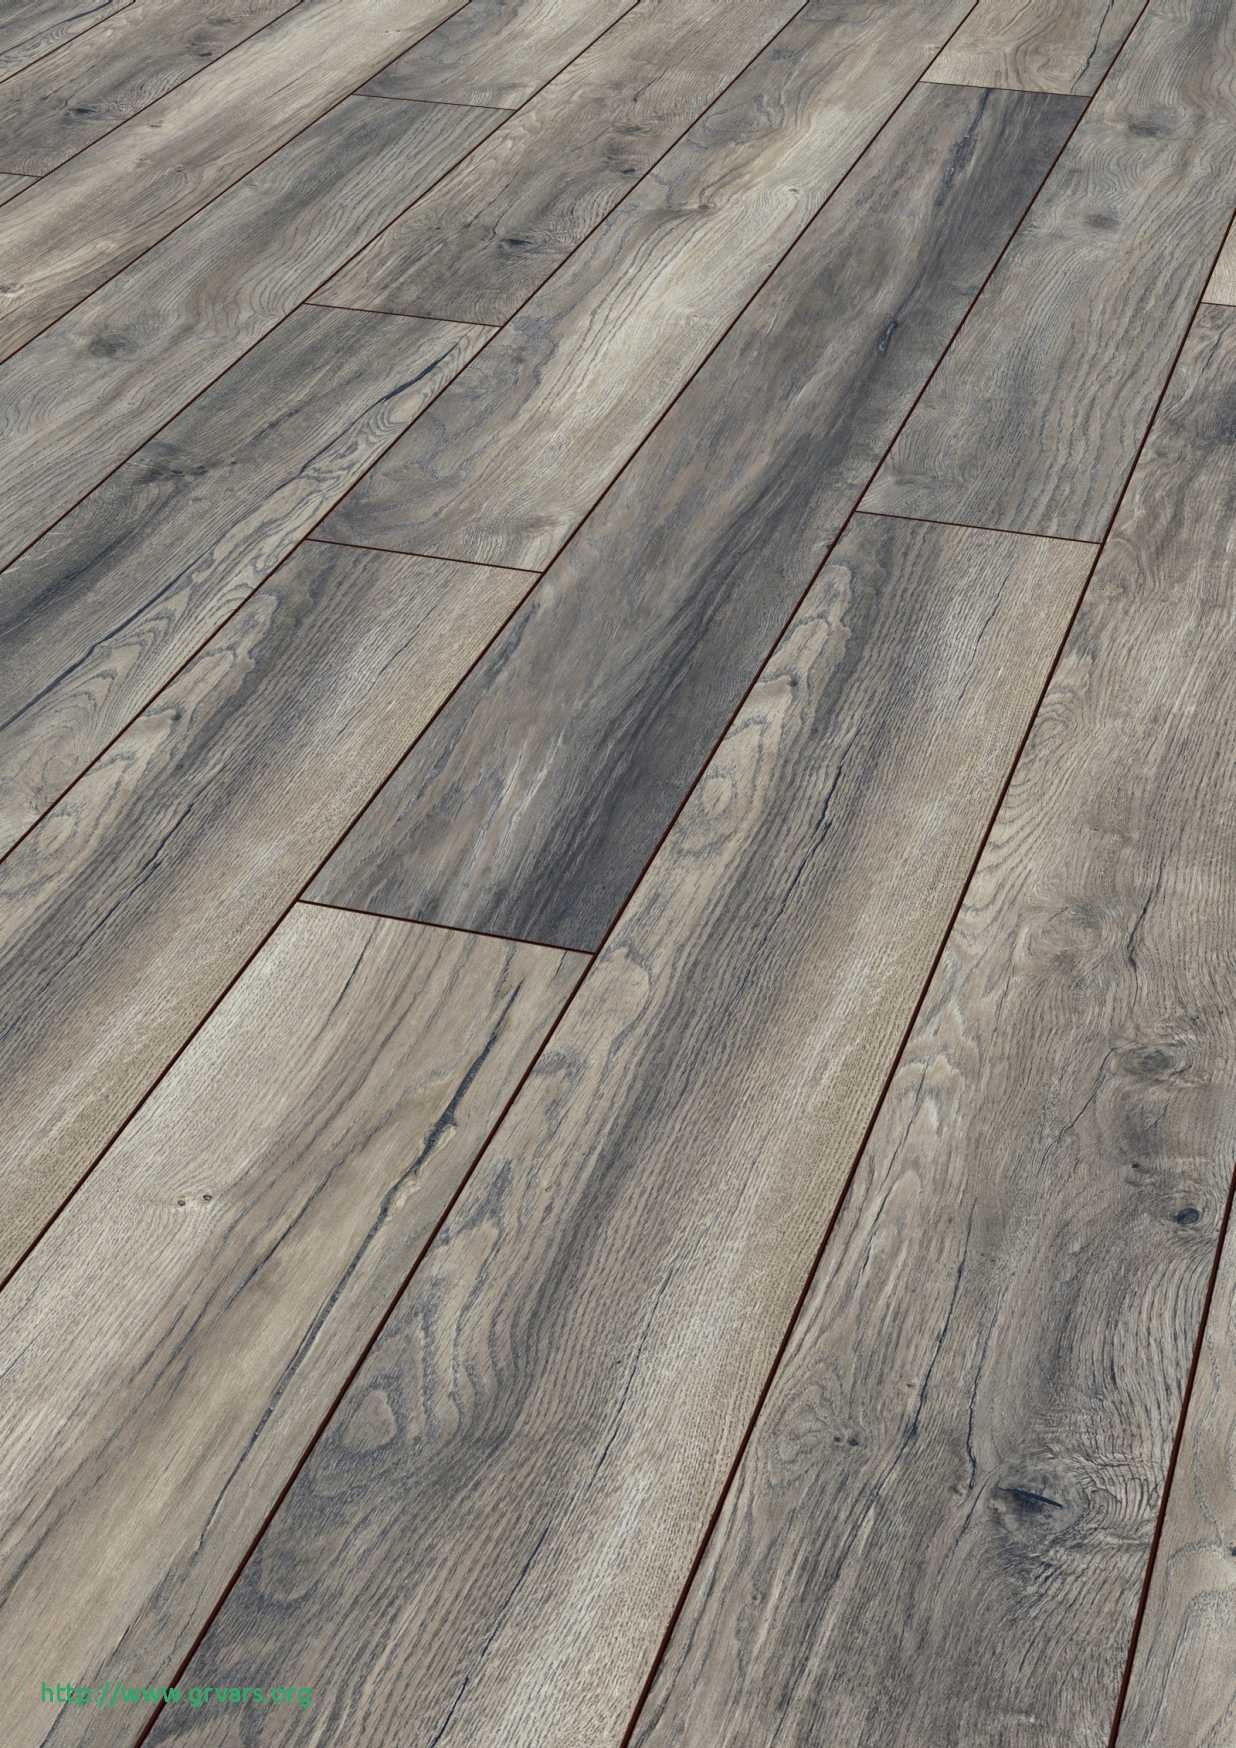 cheap hardwood flooring toronto of 21 beau cheapest hardwood flooring in toronto ideas blog for 0d cheapest hardwood flooring in toronto beau fabulous discount hardwood flooring 0 floor brampton 25 toronto